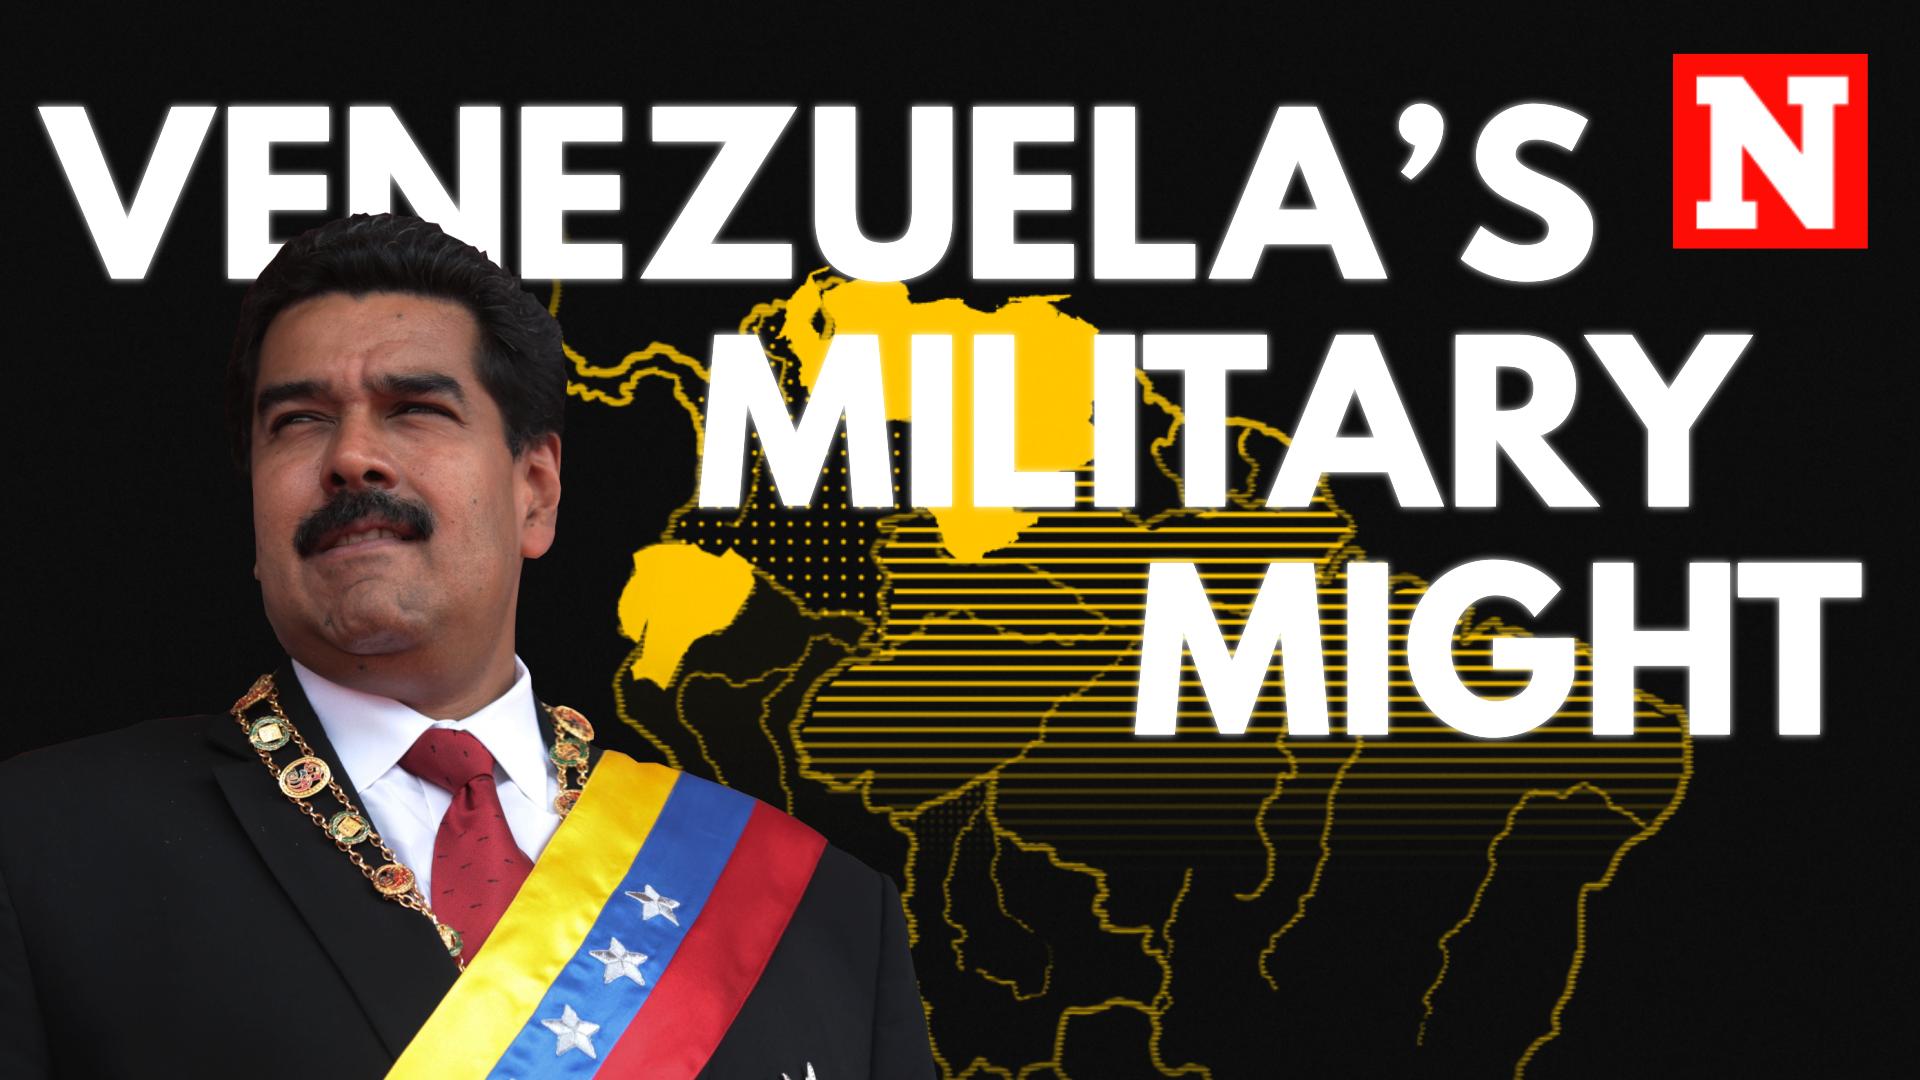 Venezuela military might